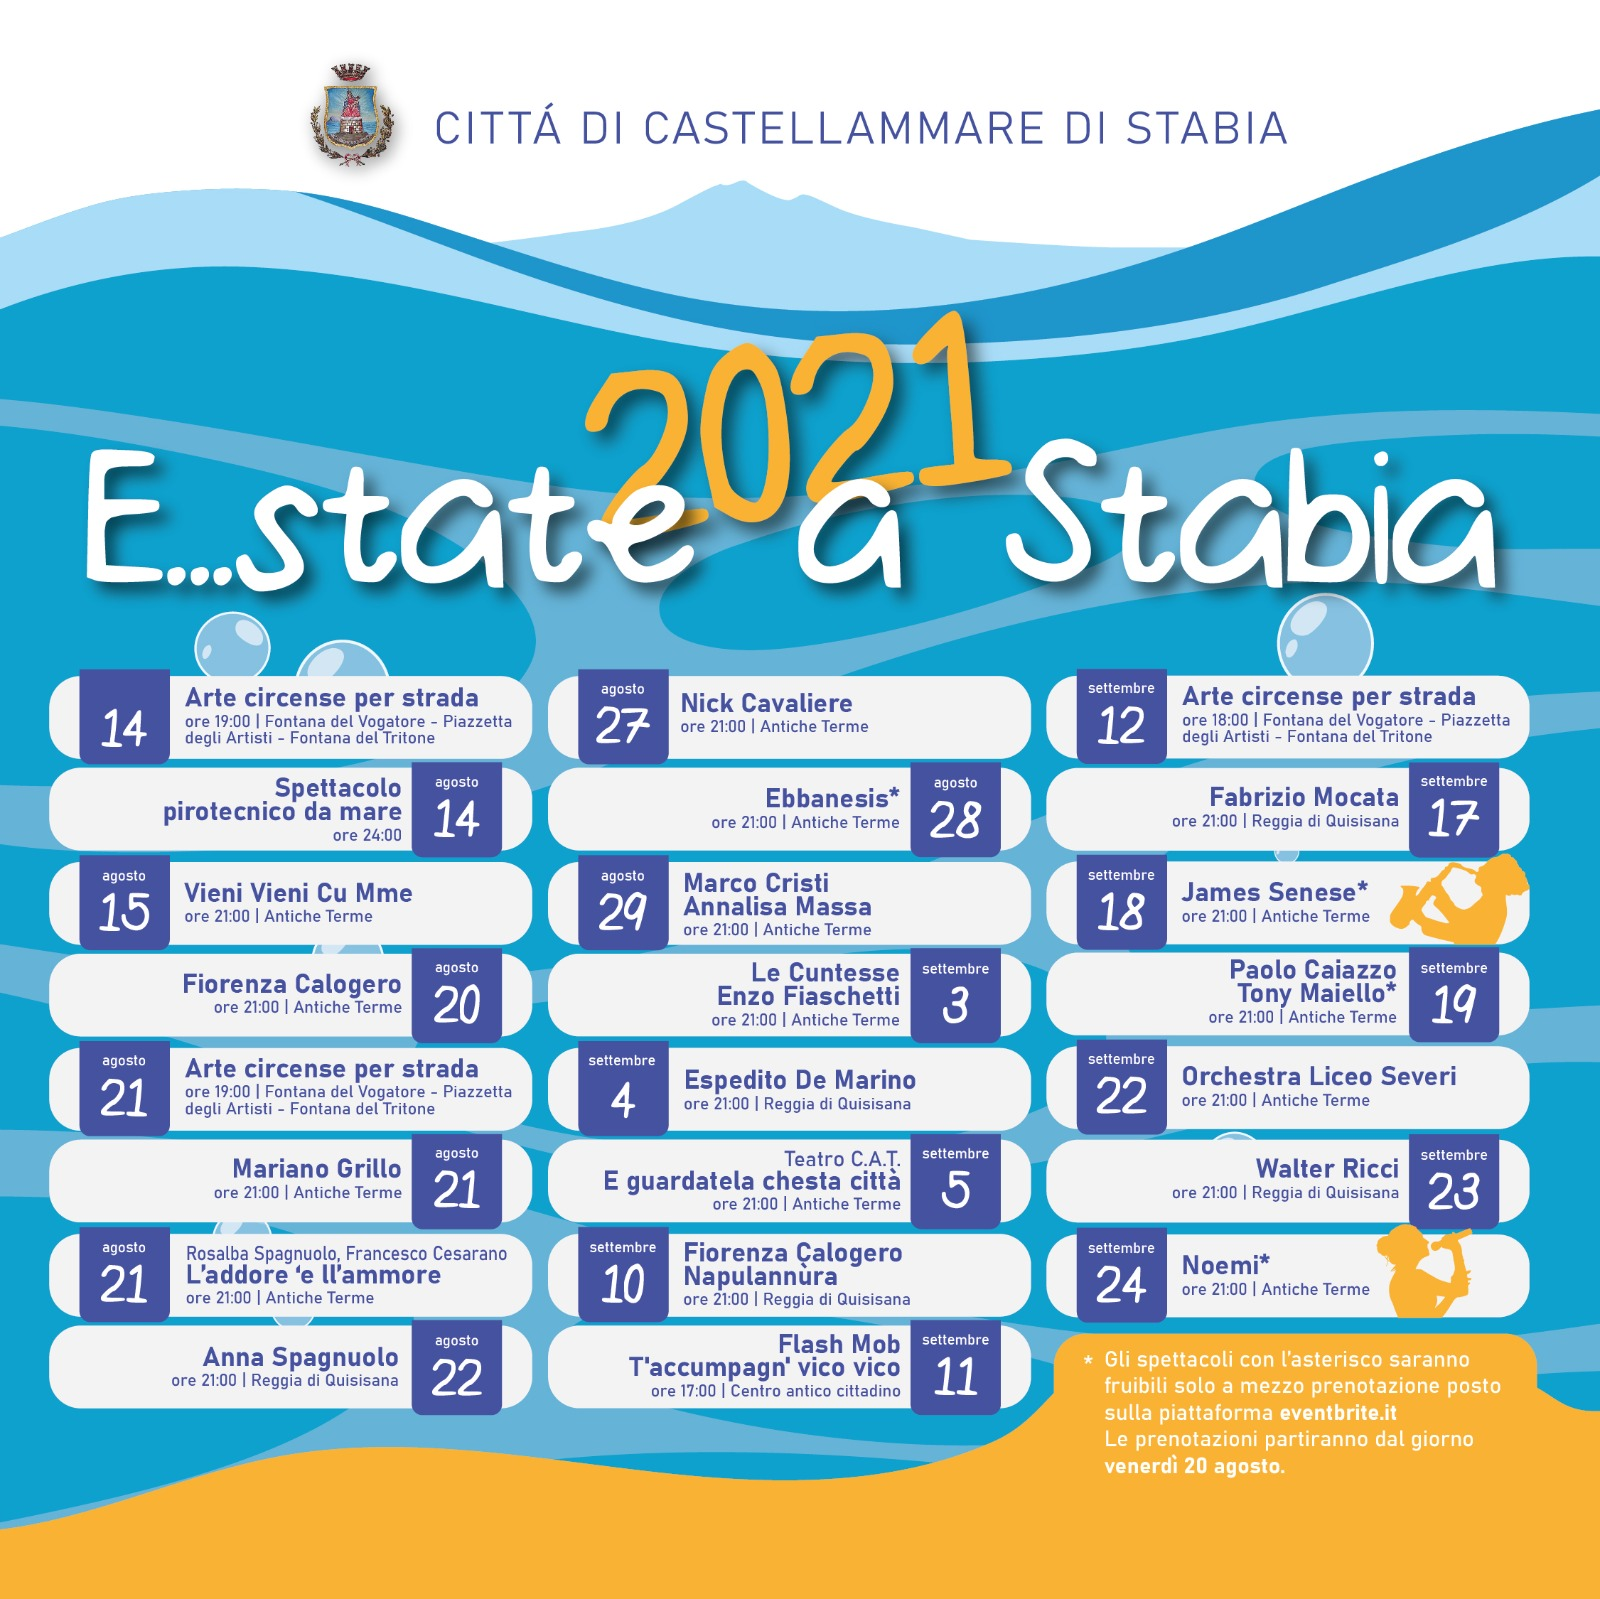 E...state a Stabia 2021